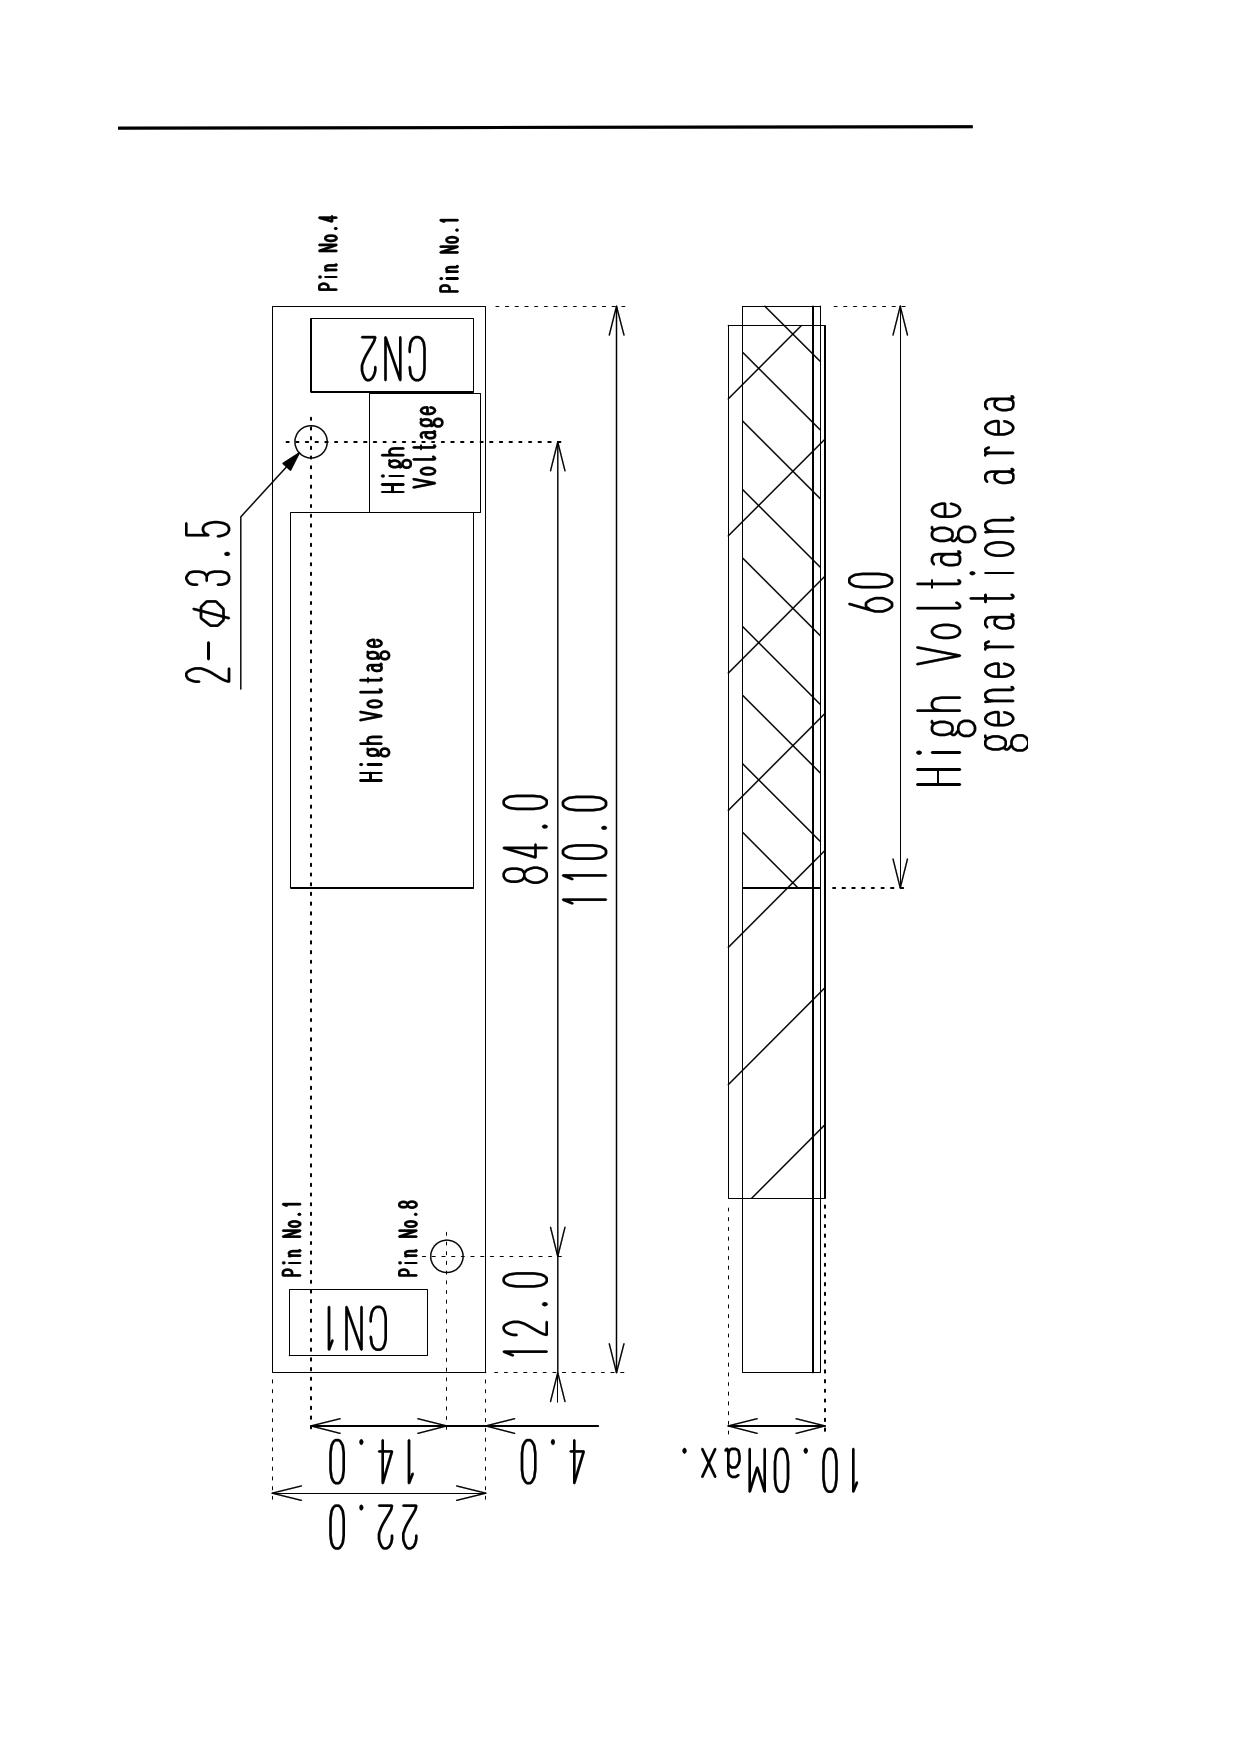 VNL08C351-INV pdf, schematic